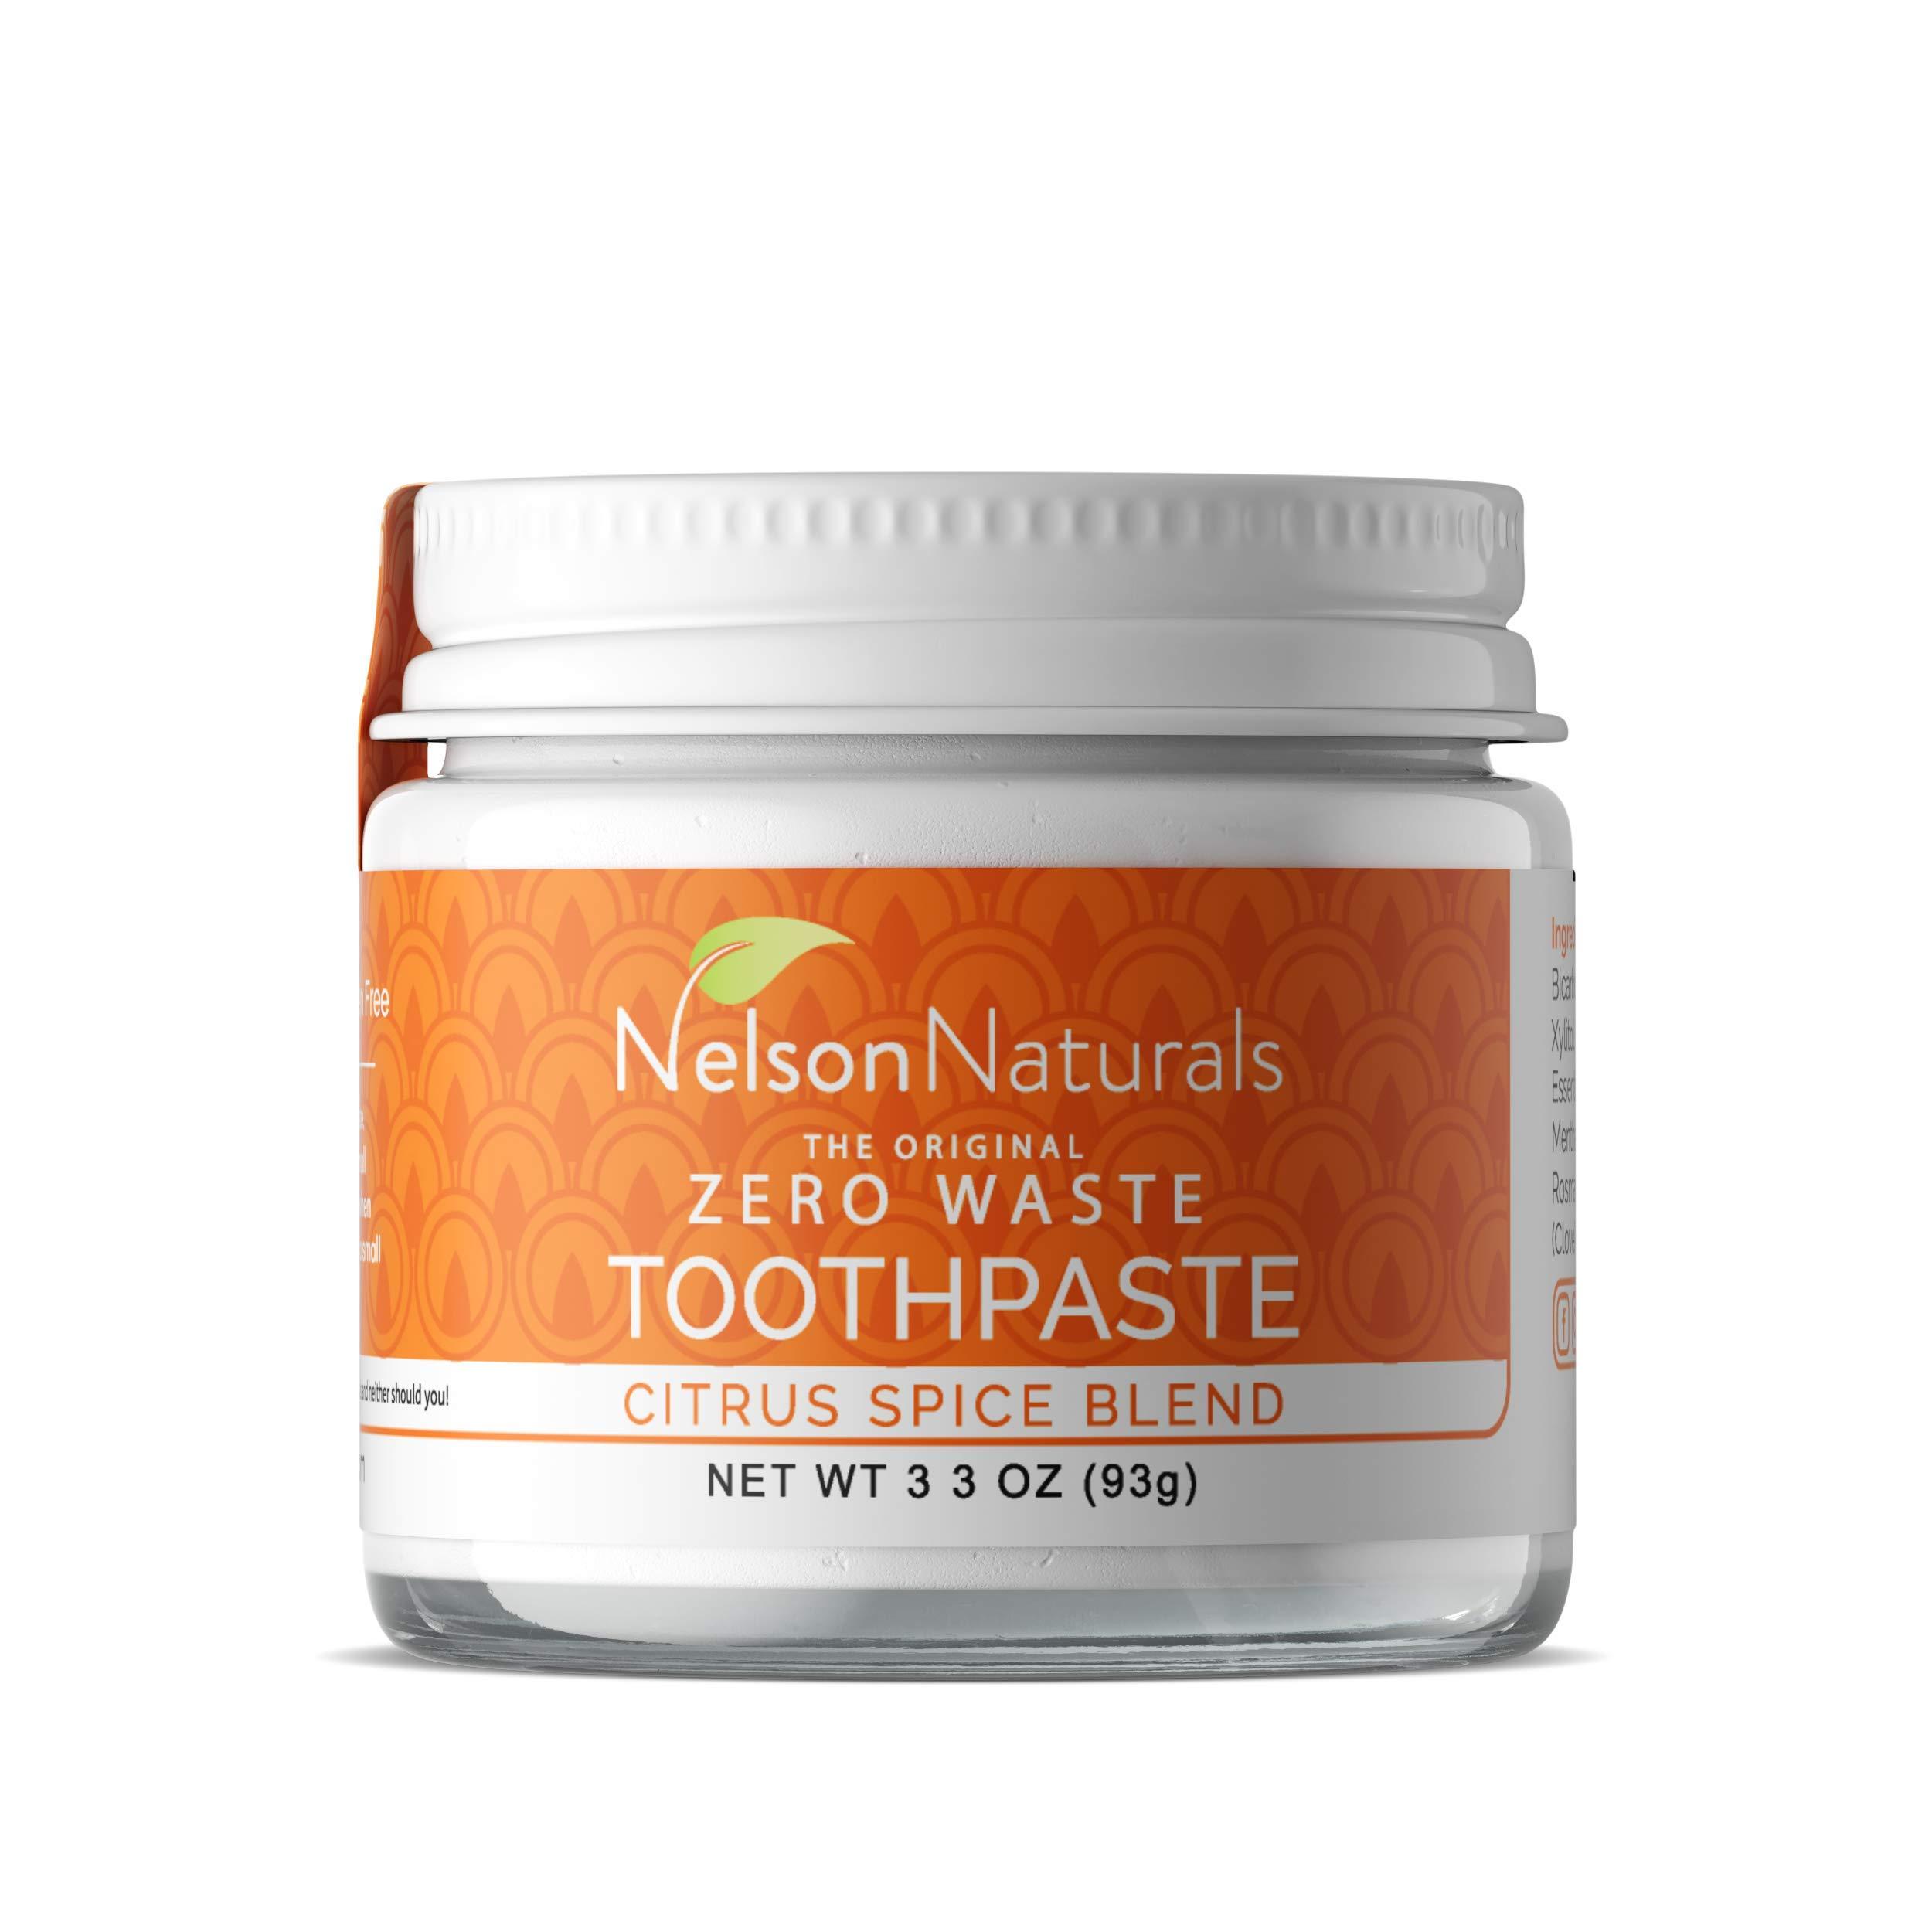 Nelson Naturals Citrus Spice Blend Fluoride Free Toothpaste 2 oz